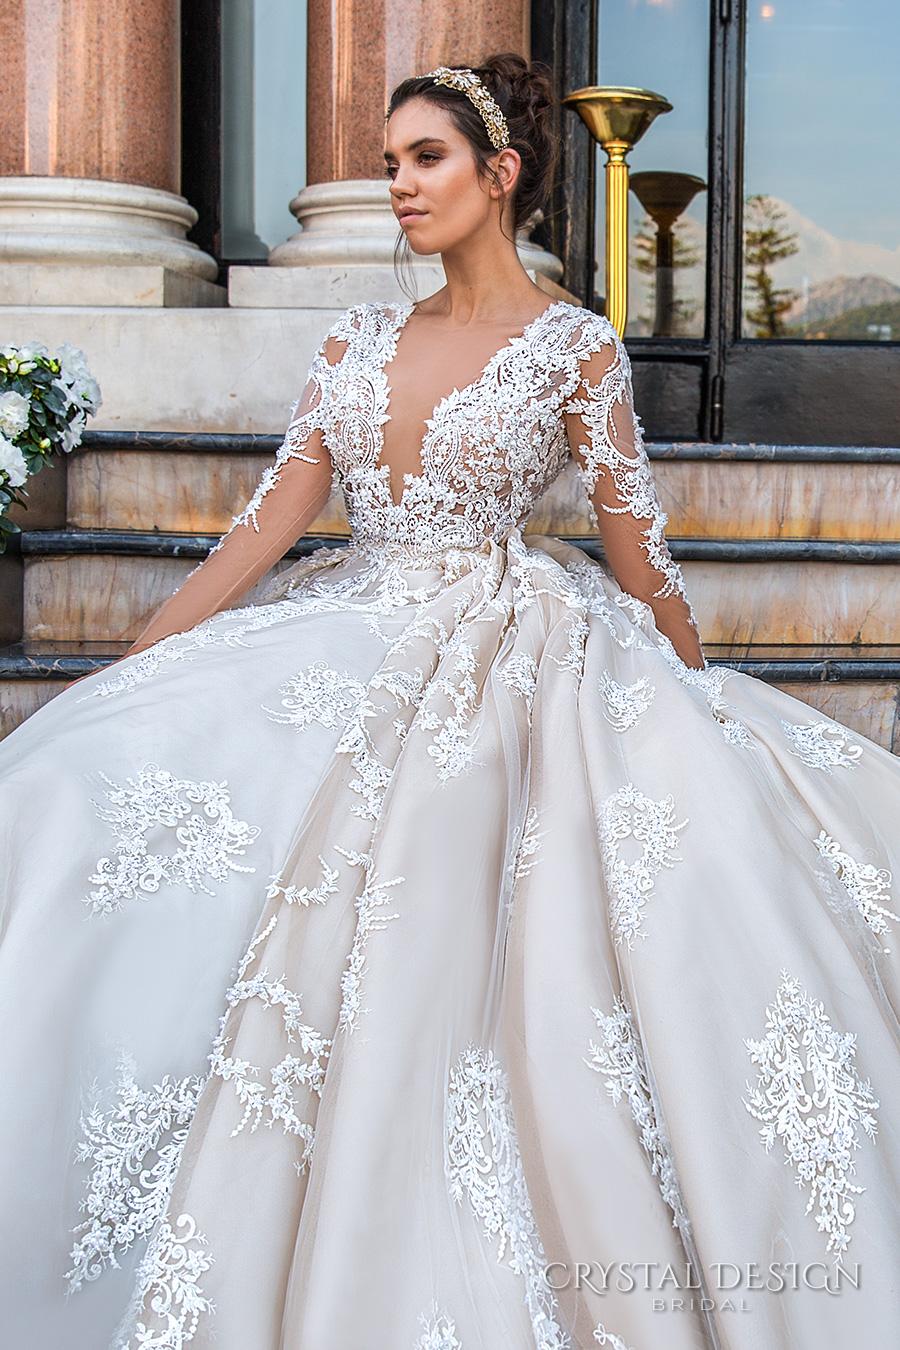 C swarovski wedding dress mainimage